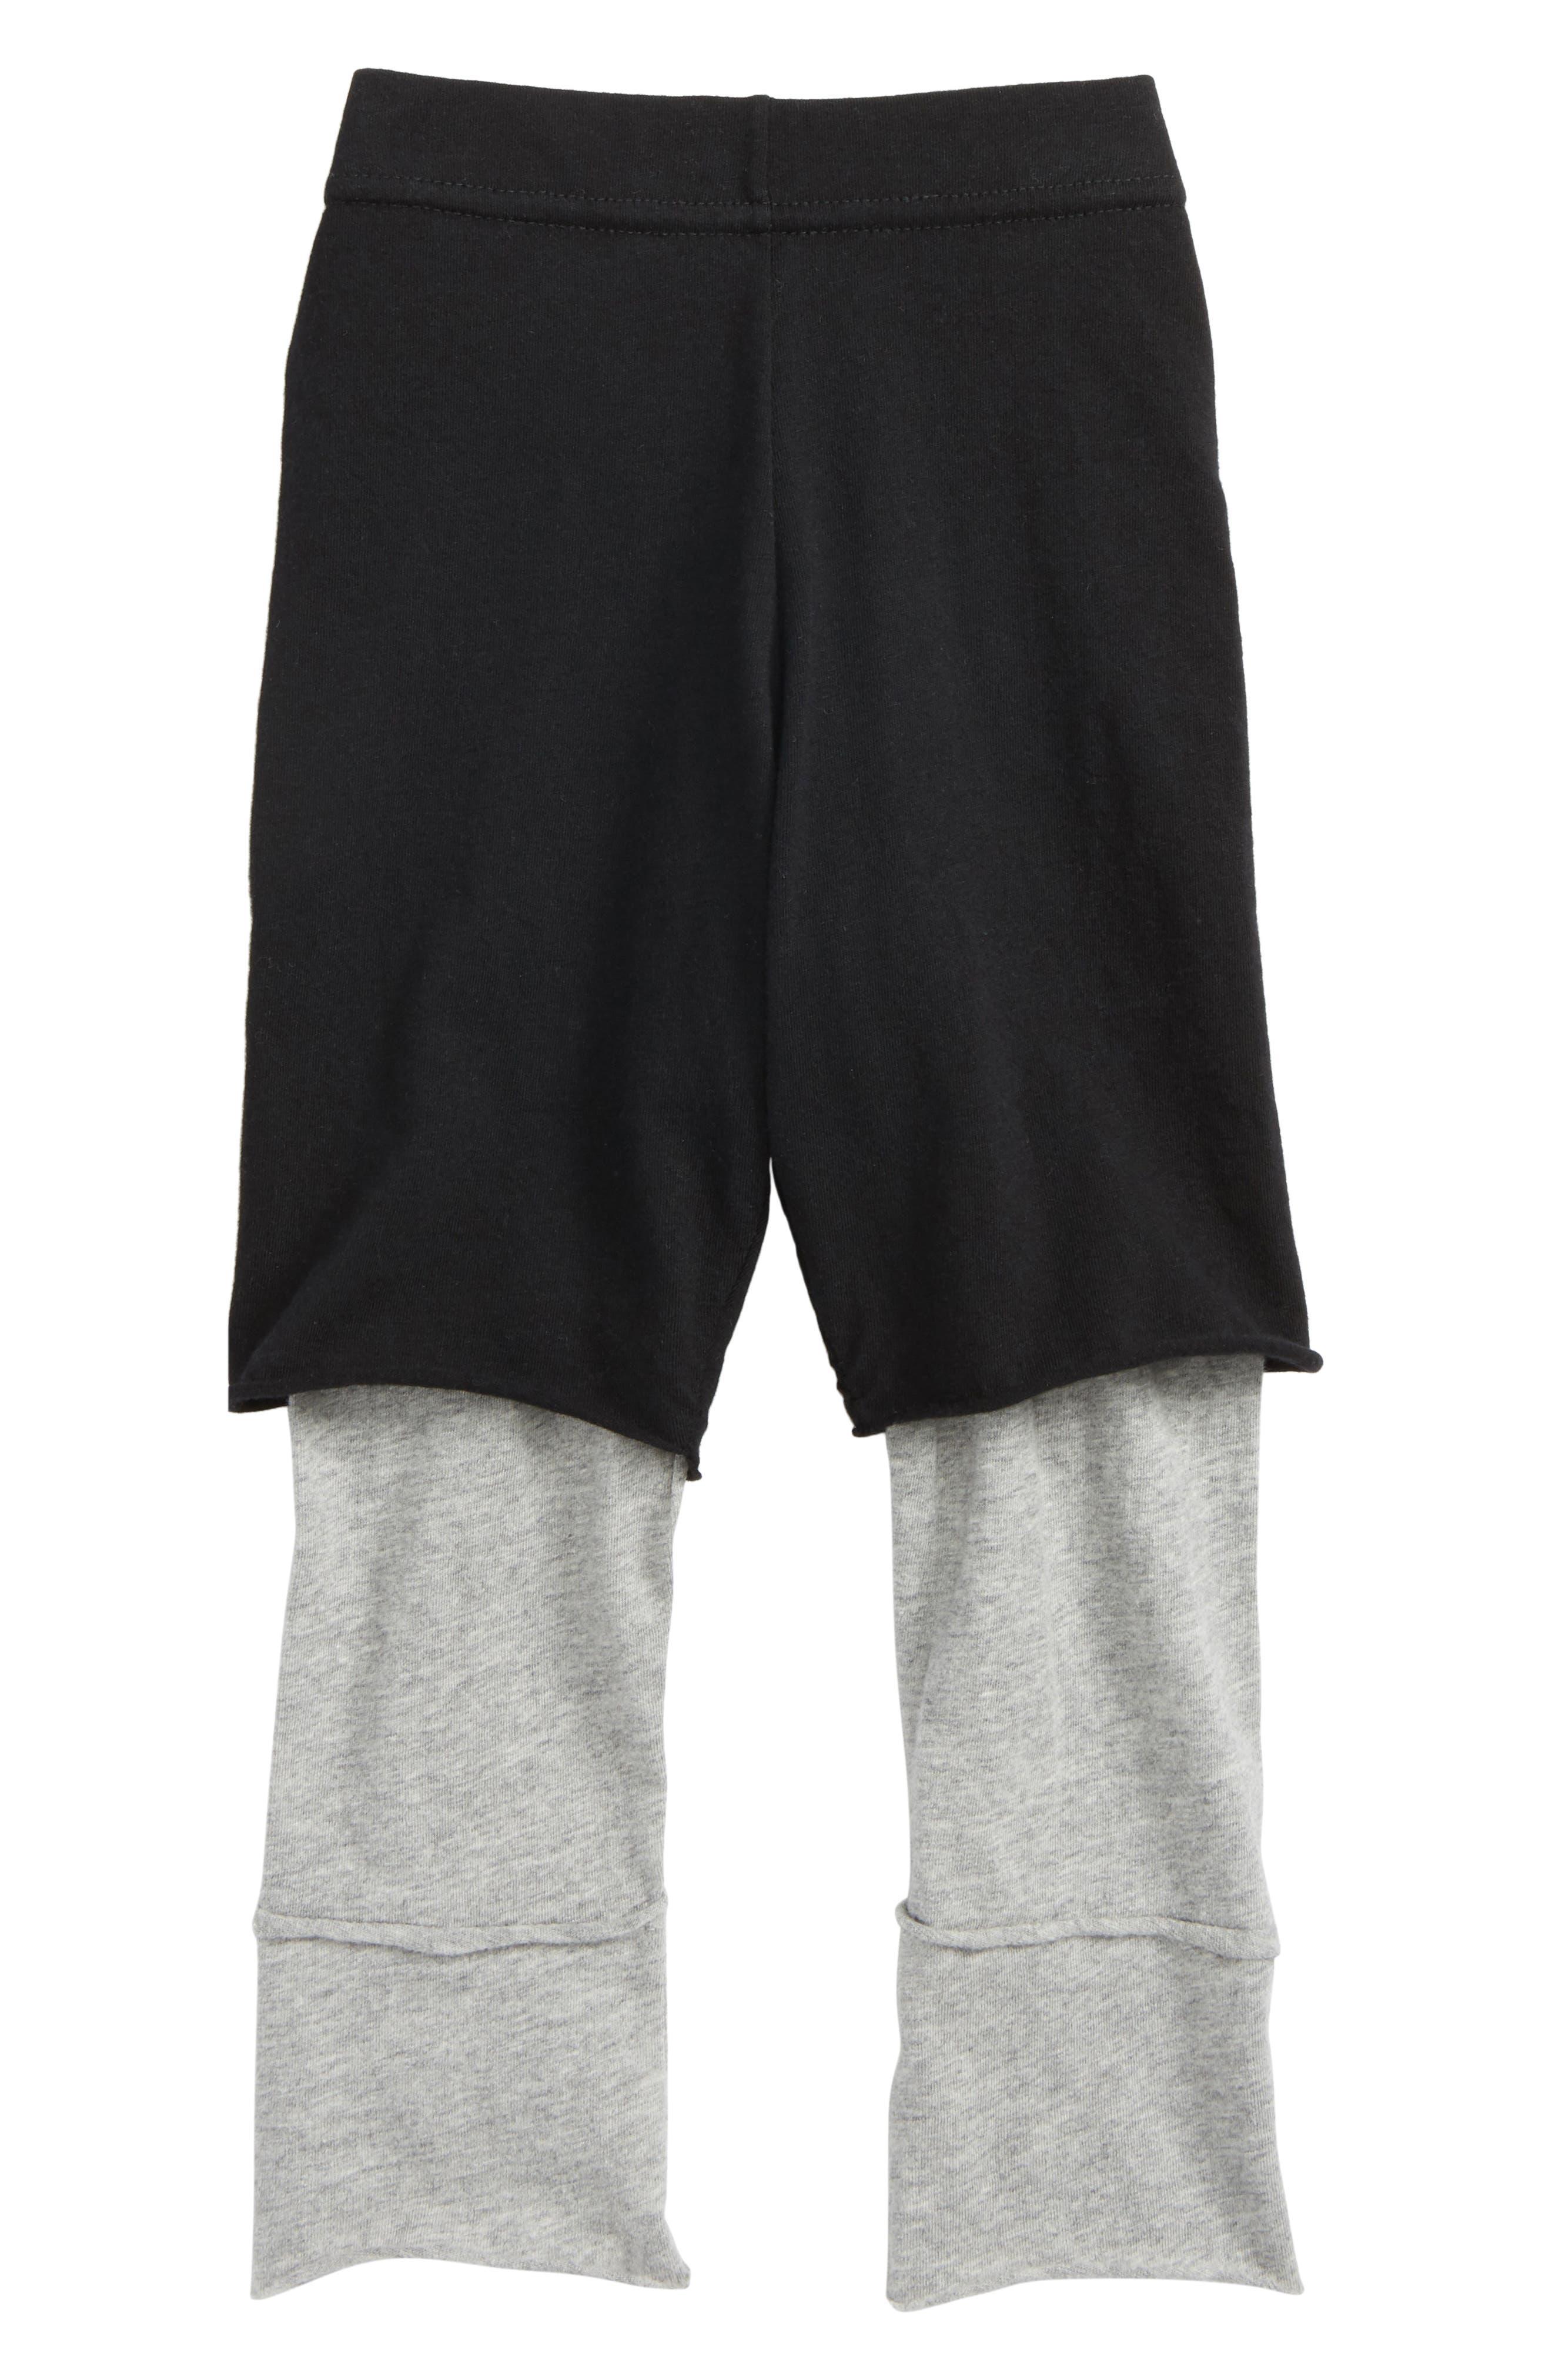 Main Image - Nununu One on One Layered Pants (Baby)